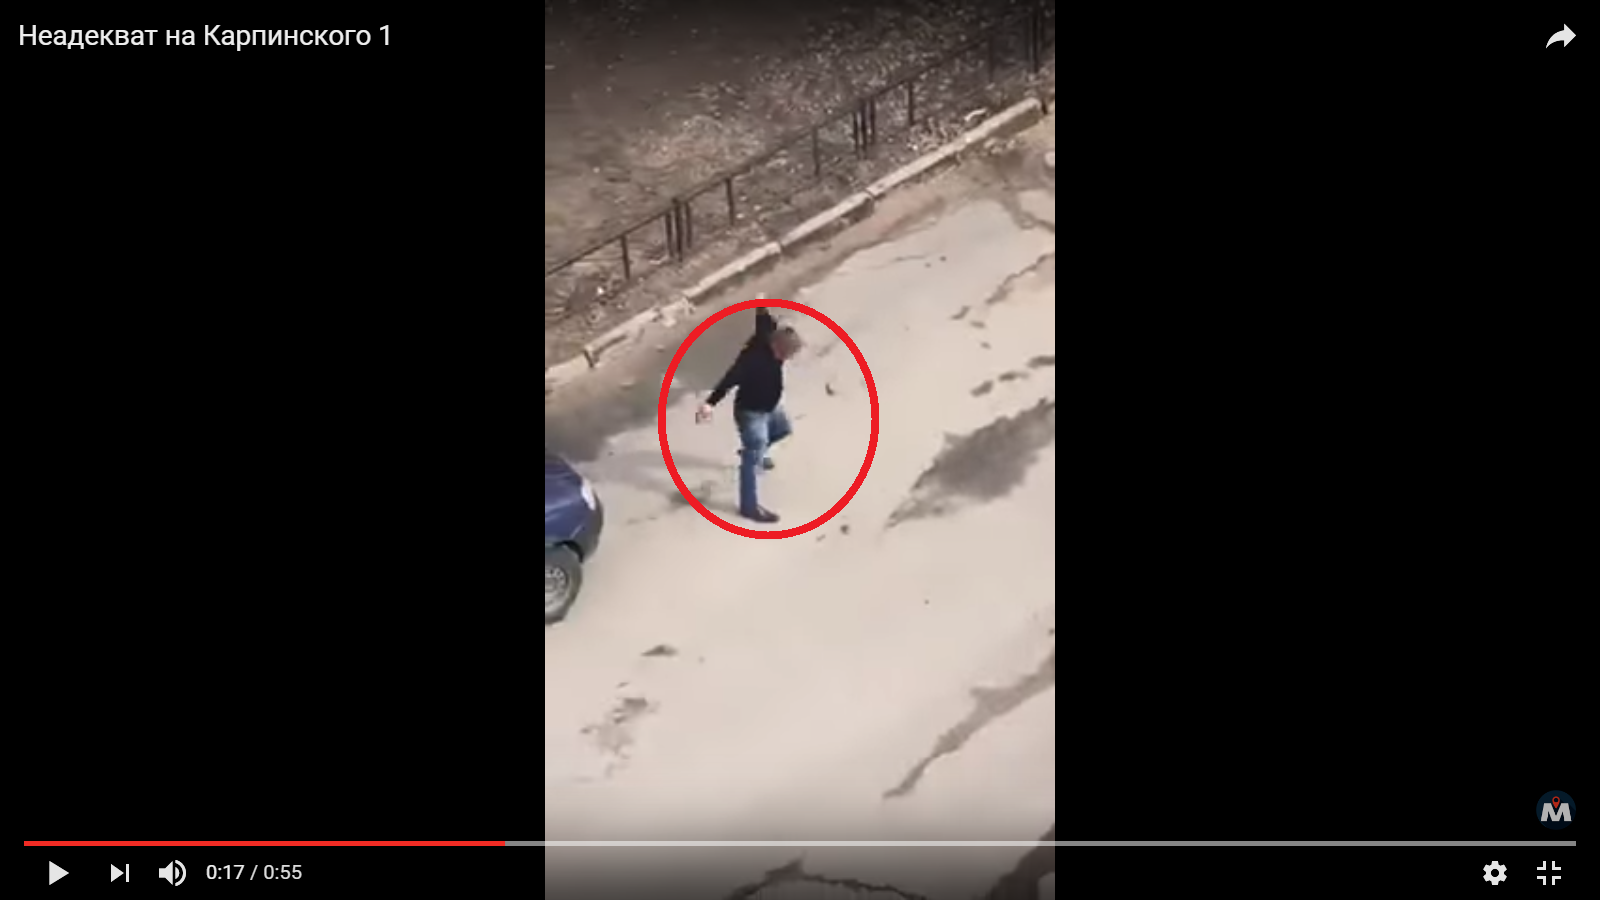 Появилось видео танца неадекватного водителя, который чудом не сбил женщину с ребенком http://kleinburd.ru/news/poyavilos-video-tanca-neadekvatnogo-voditelya-kotoryj-chudom-ne-sbil-zhenshhinu-s-rebenkom/